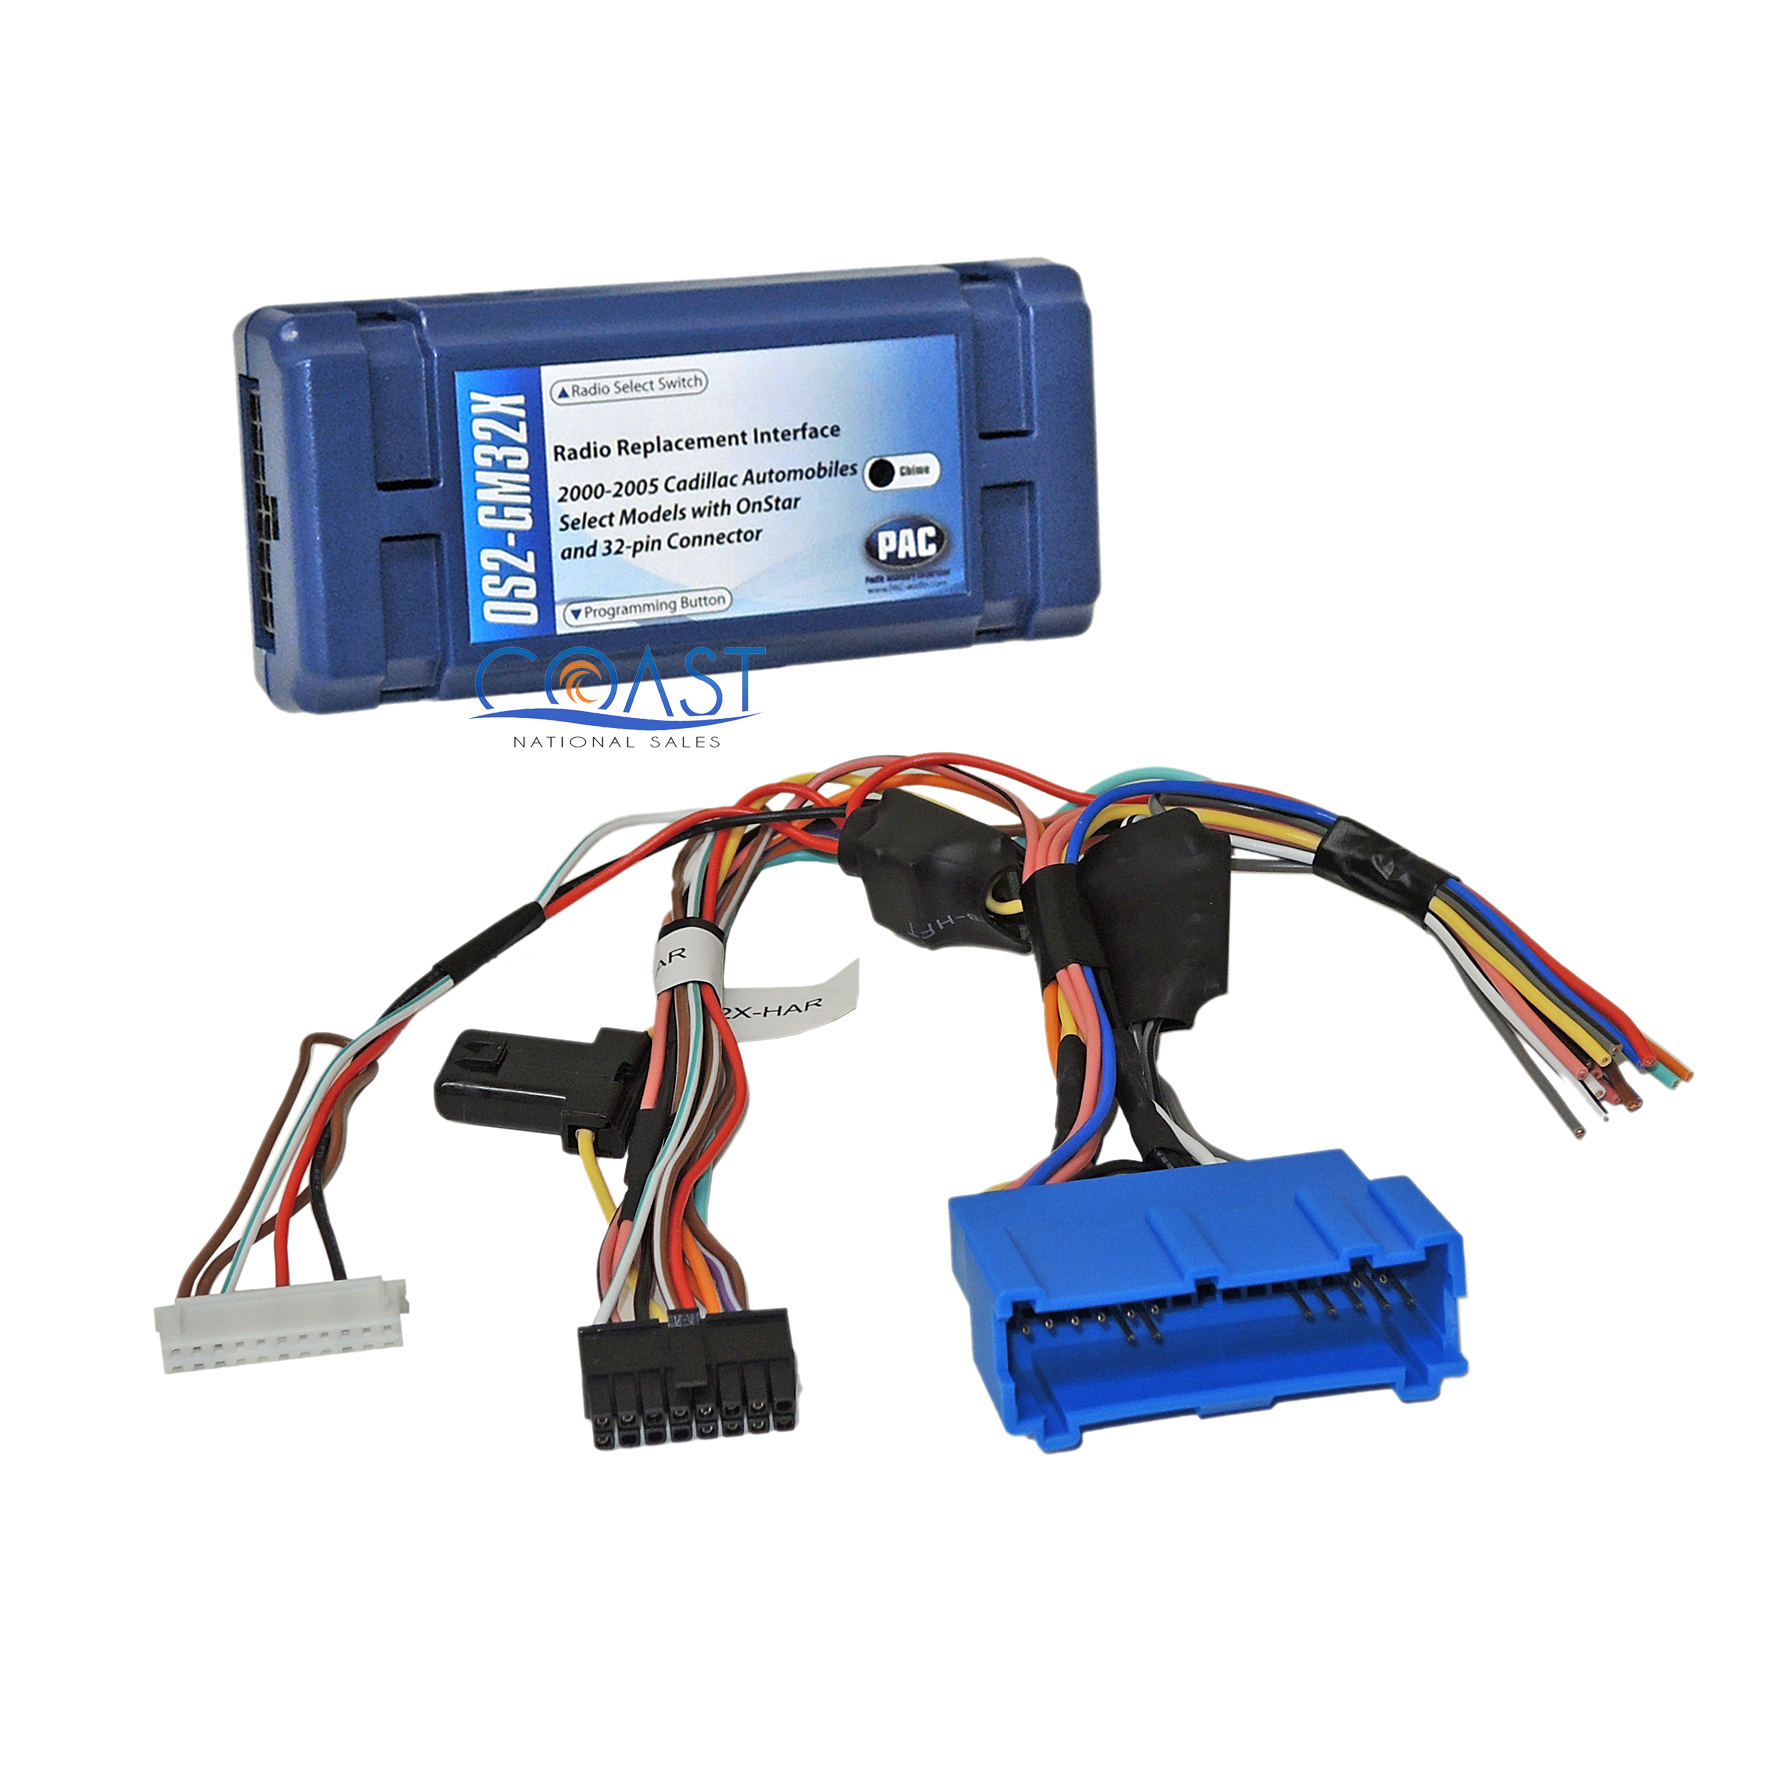 Car Radio Bose Onstar Interface For 2000